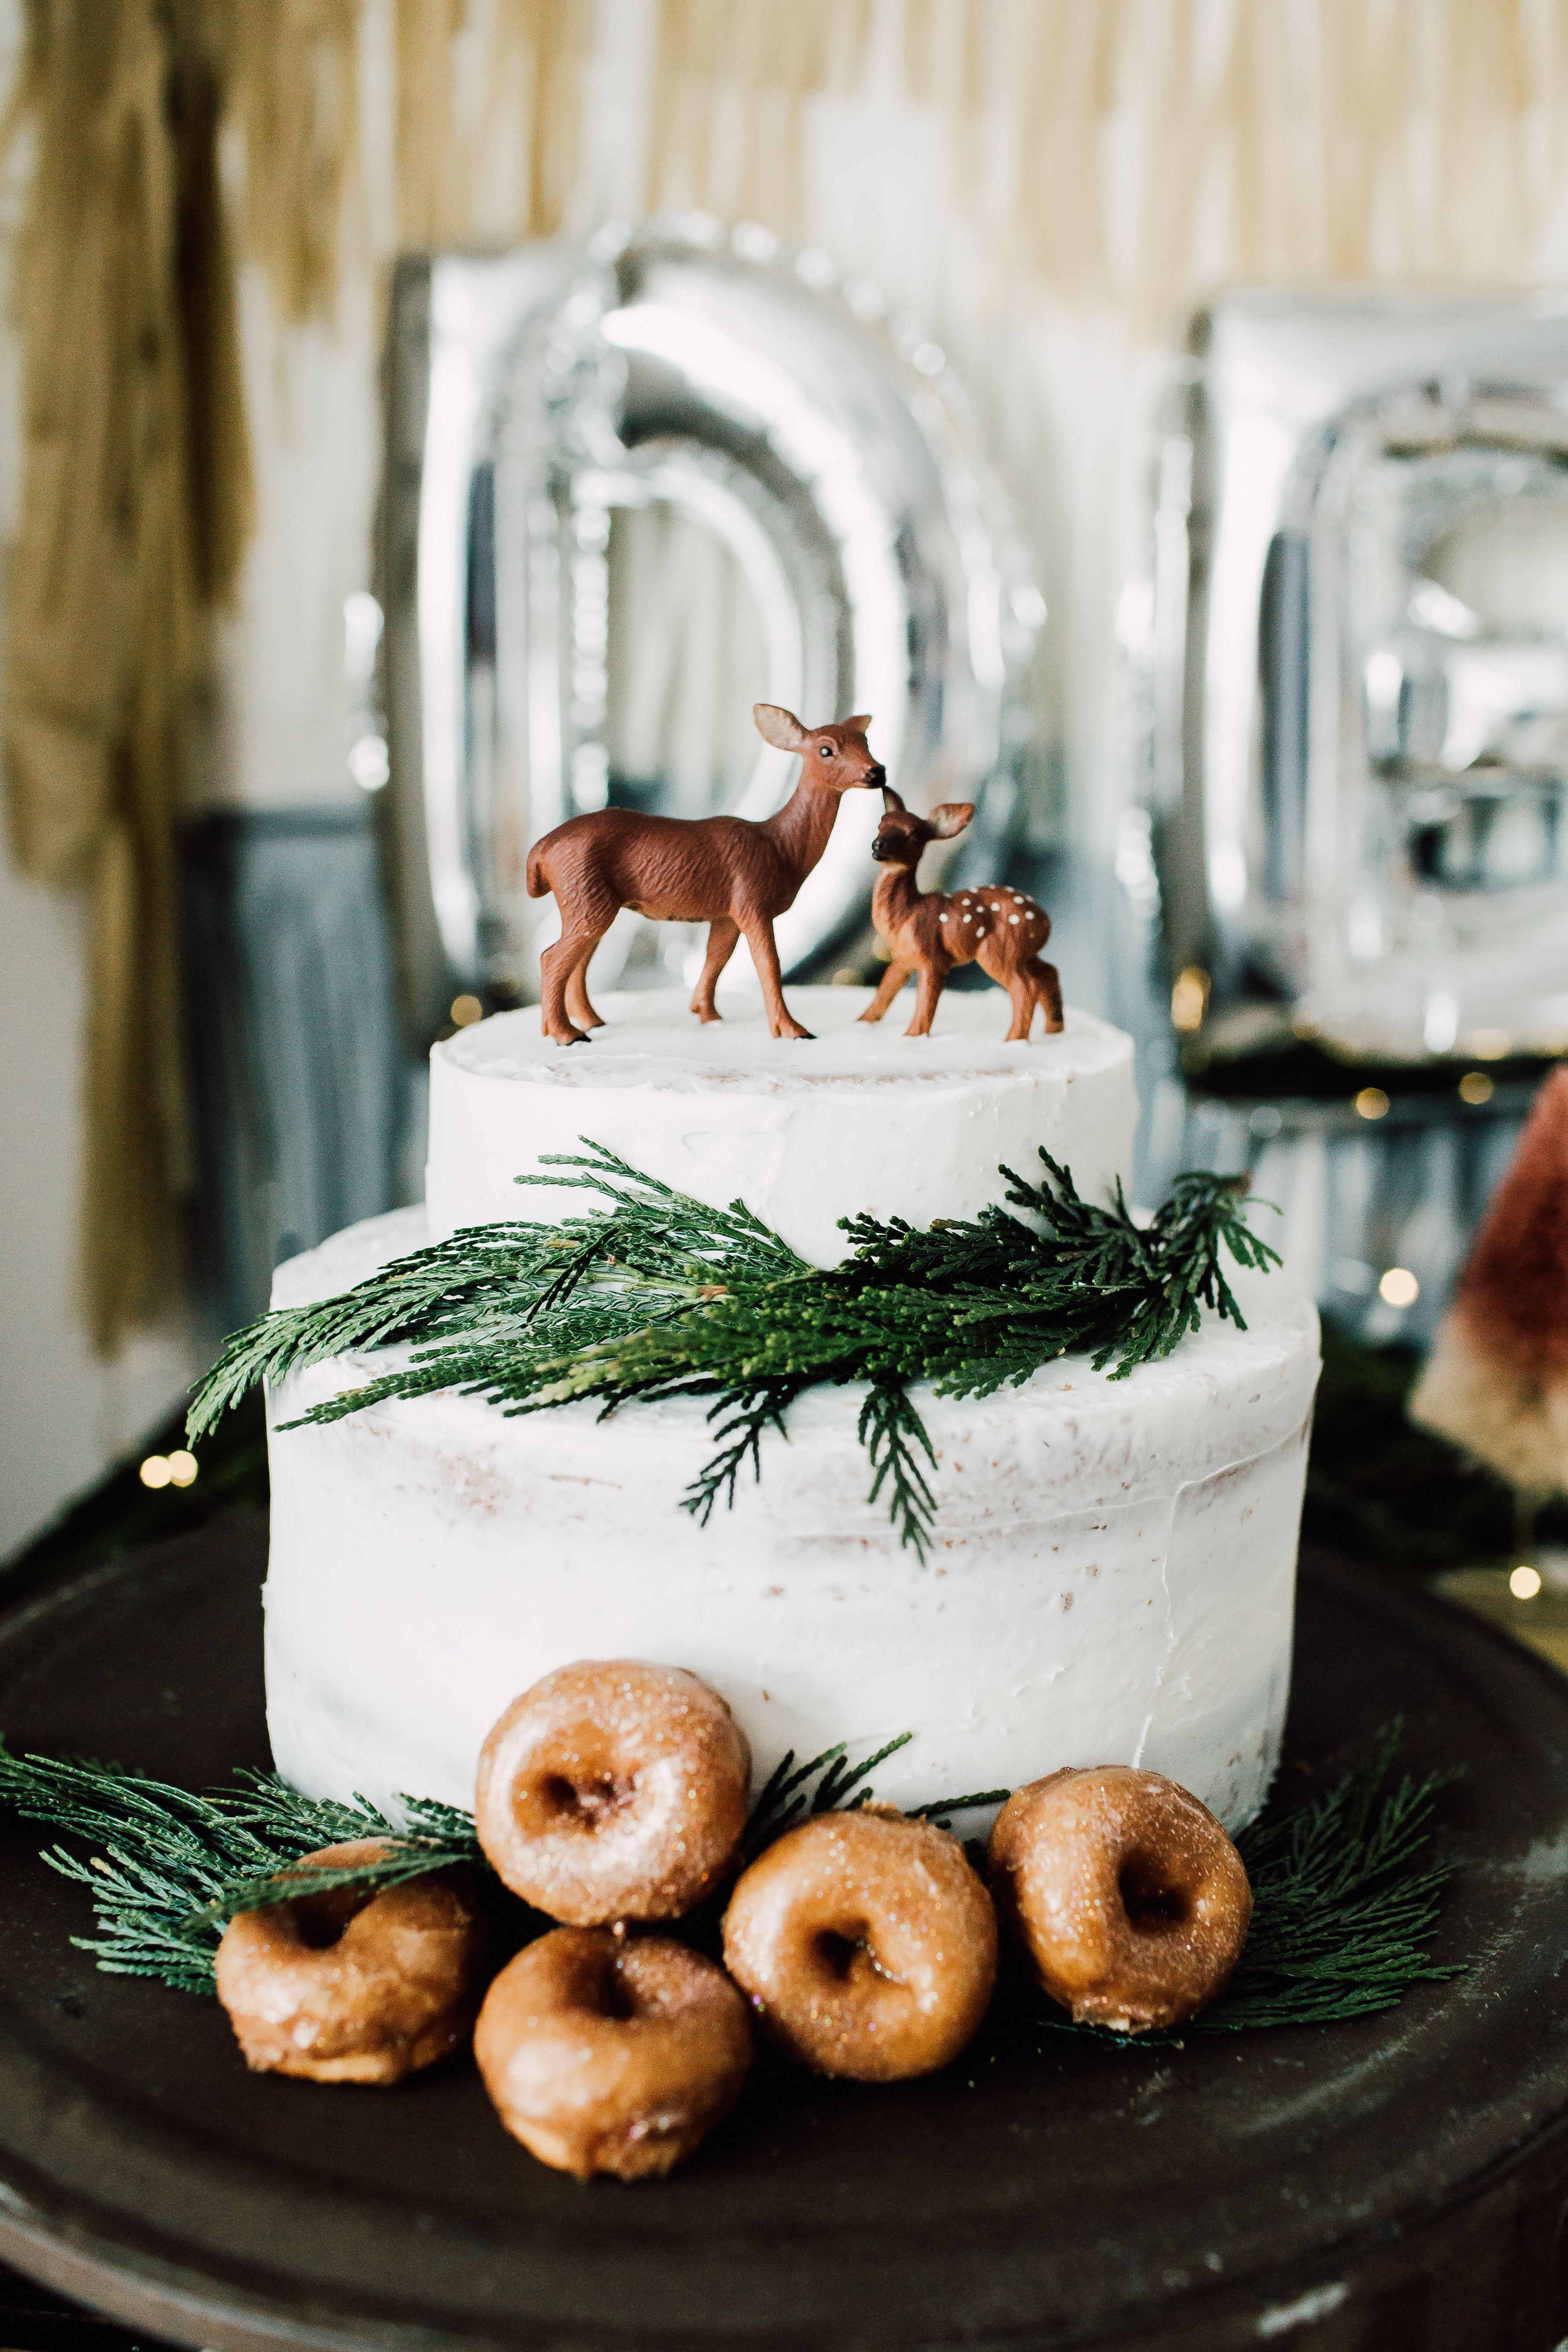 Winter Onderland First Birthday Cake Lets Have Fun Onederland Cakes